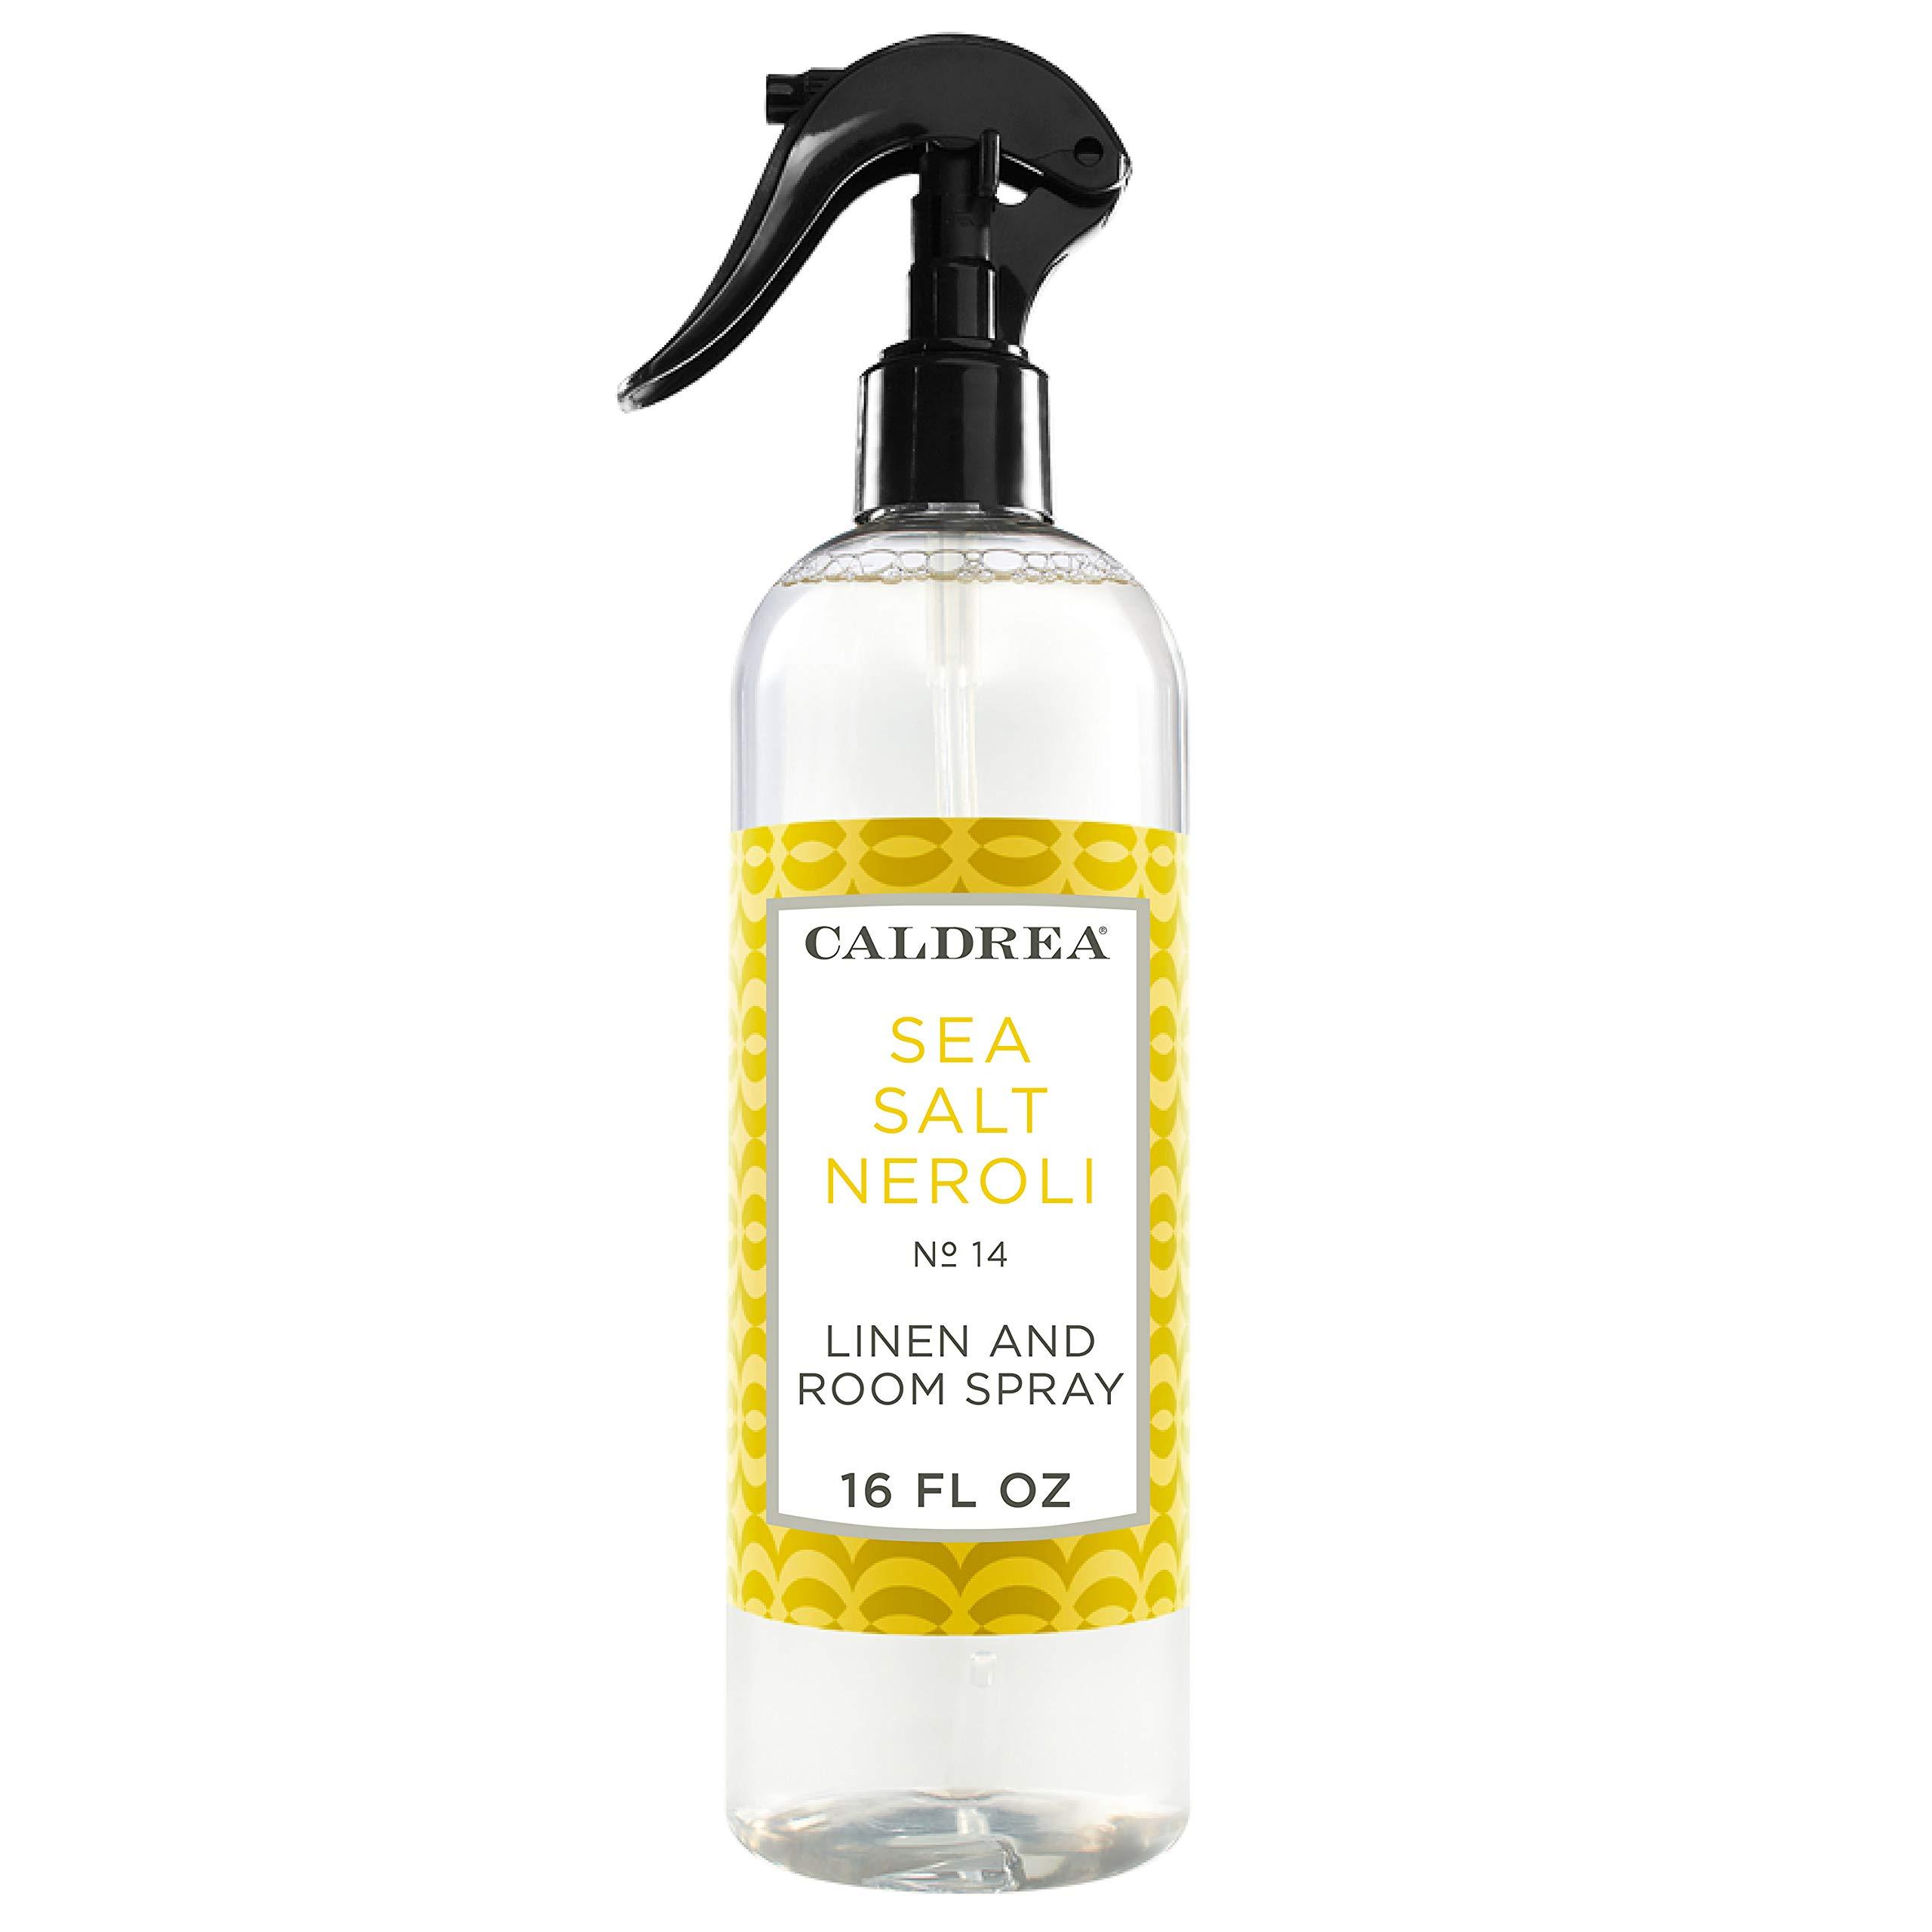 Caldrea Sea Salt Neroli Linen and Room Spray Air Freshener 16 oz by Caldrea (Image #1)